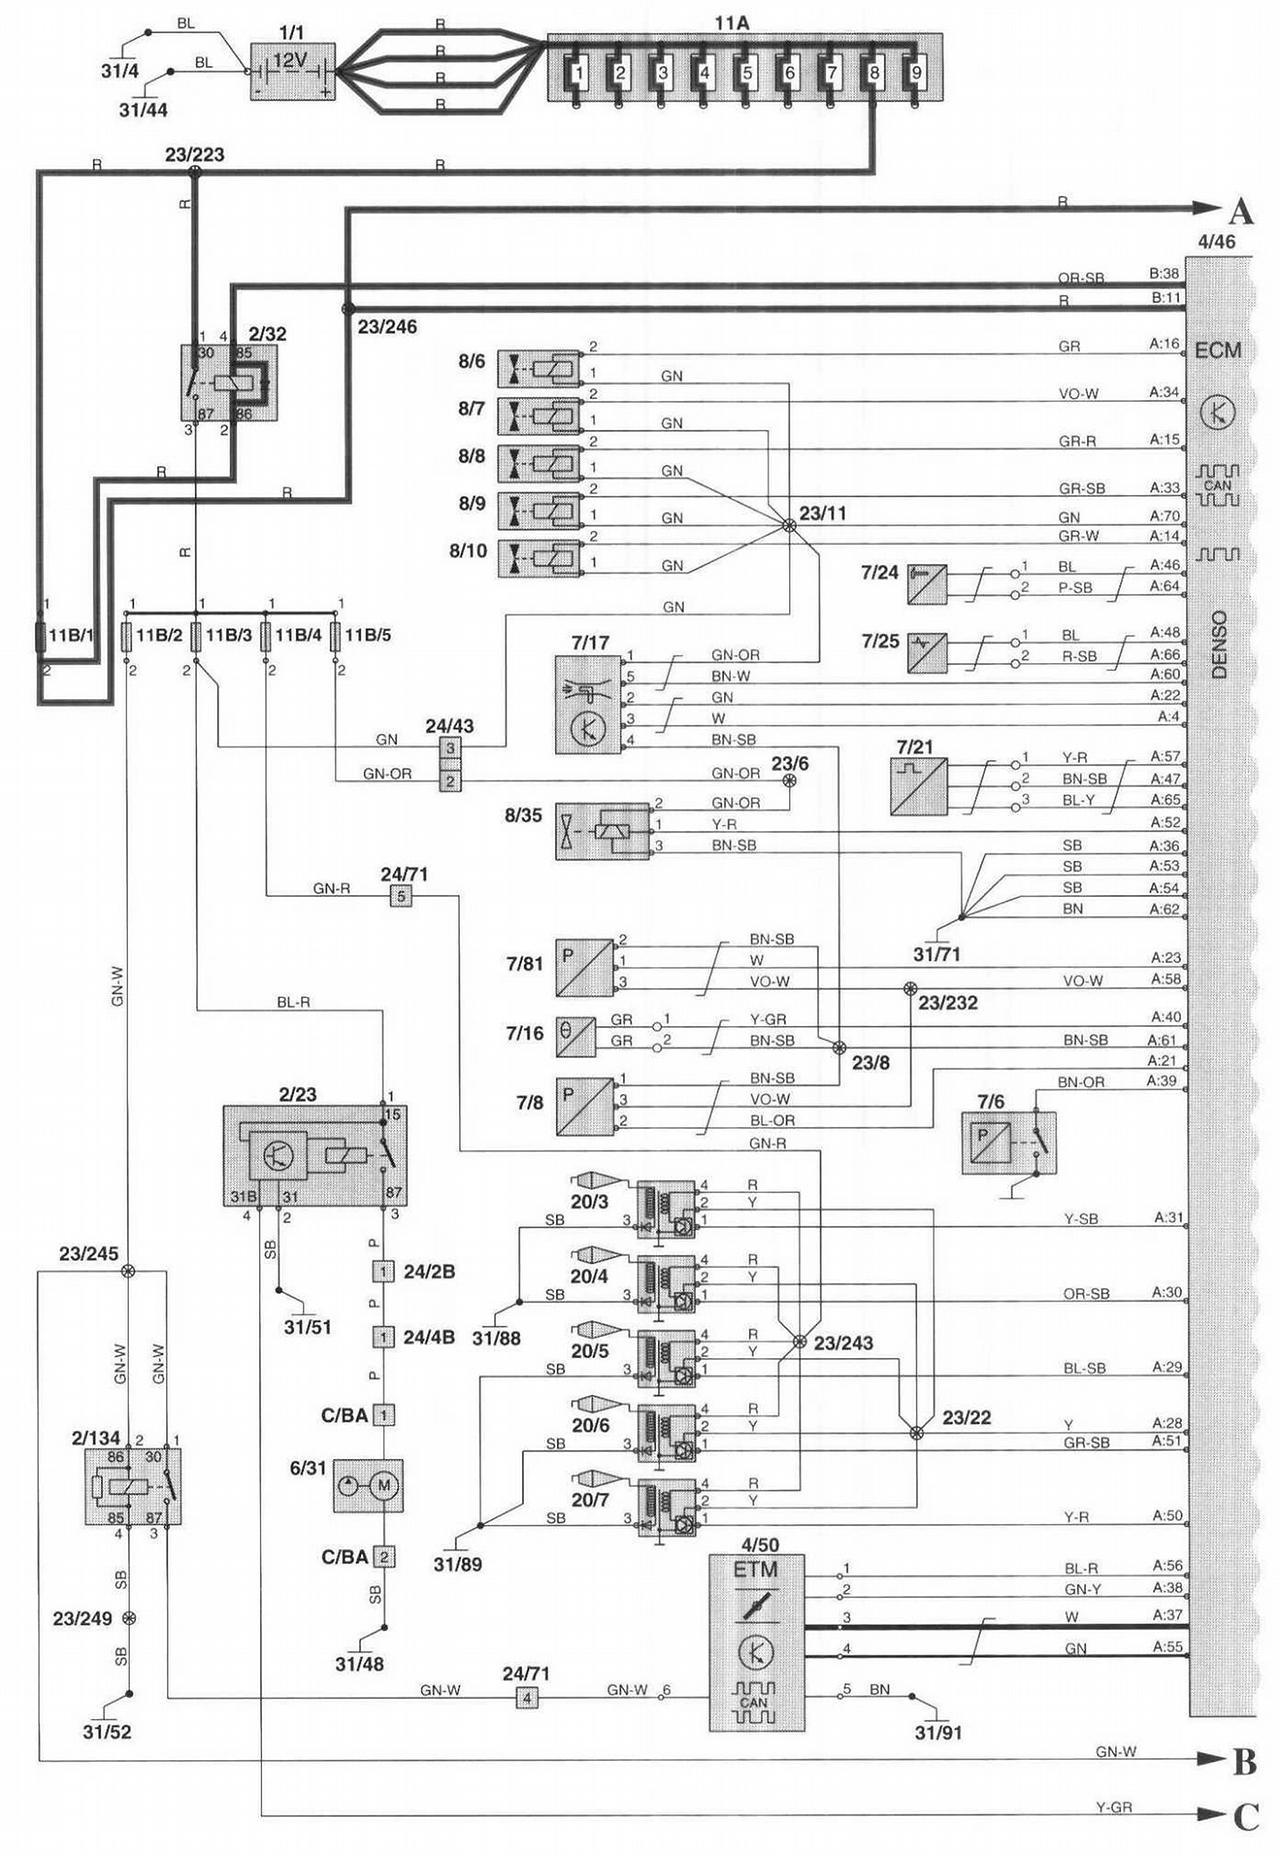 volvo xc90 wiring diagram 25 wiring diagram images wiring 2005 volvo xc70 2003 volvo xc90 wiringdiagram crdeugb?resize\\\\d665%2c964\\\\6ssl\\